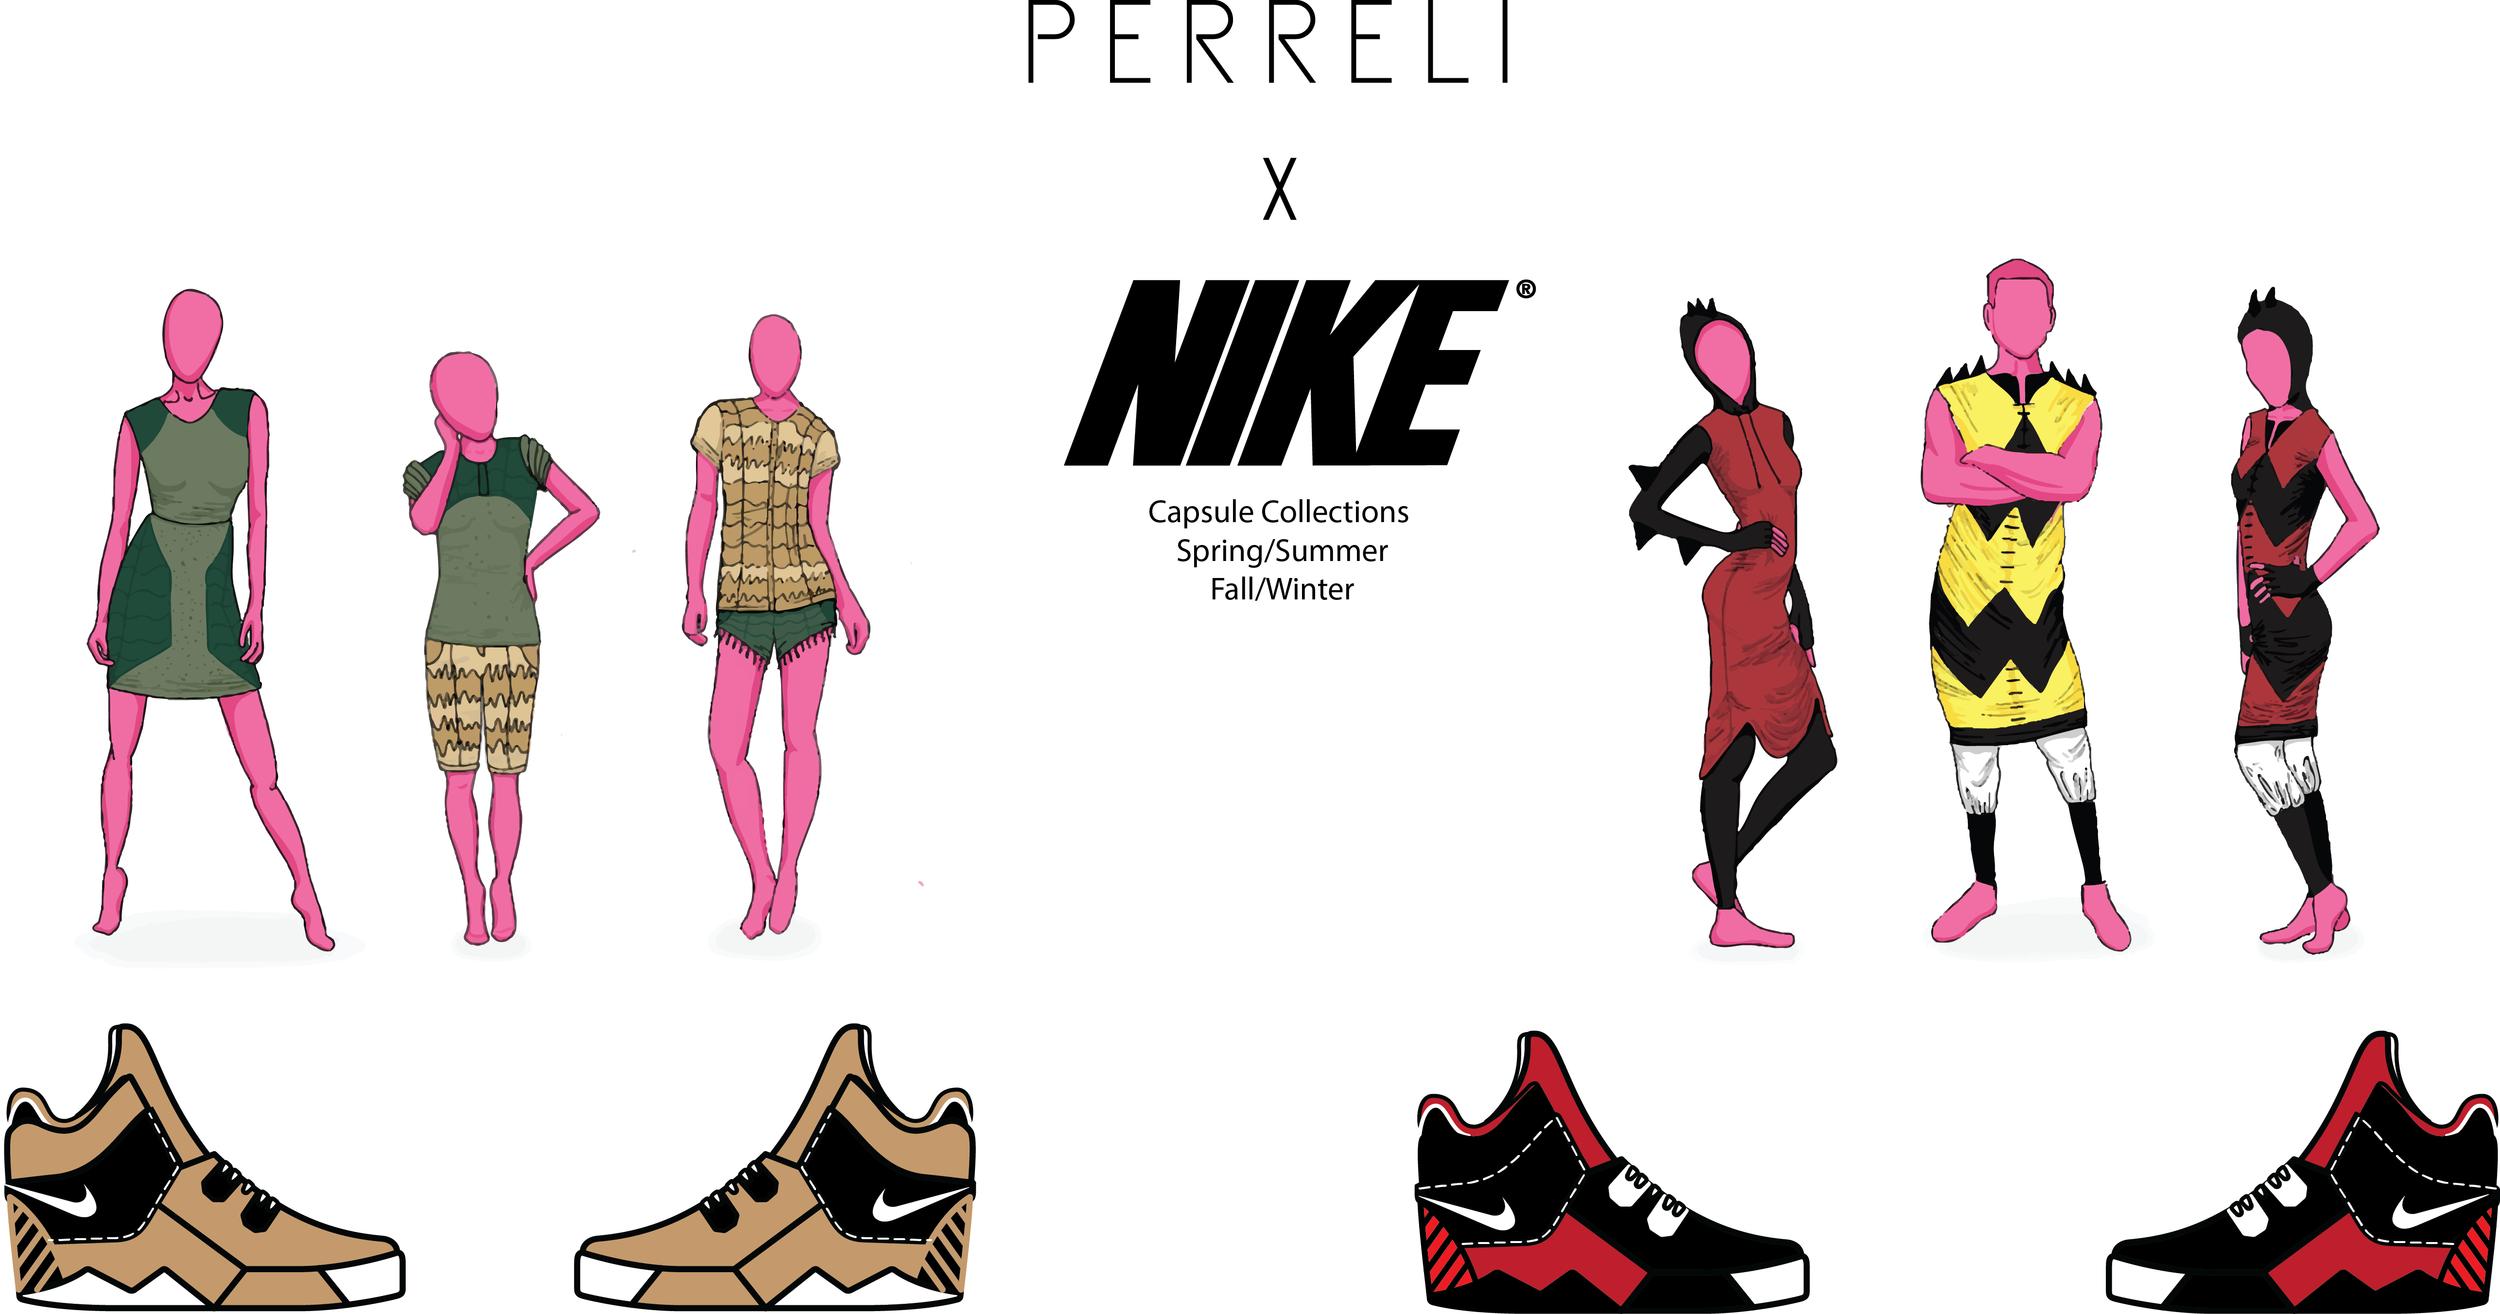 Perrelli x Nike.png